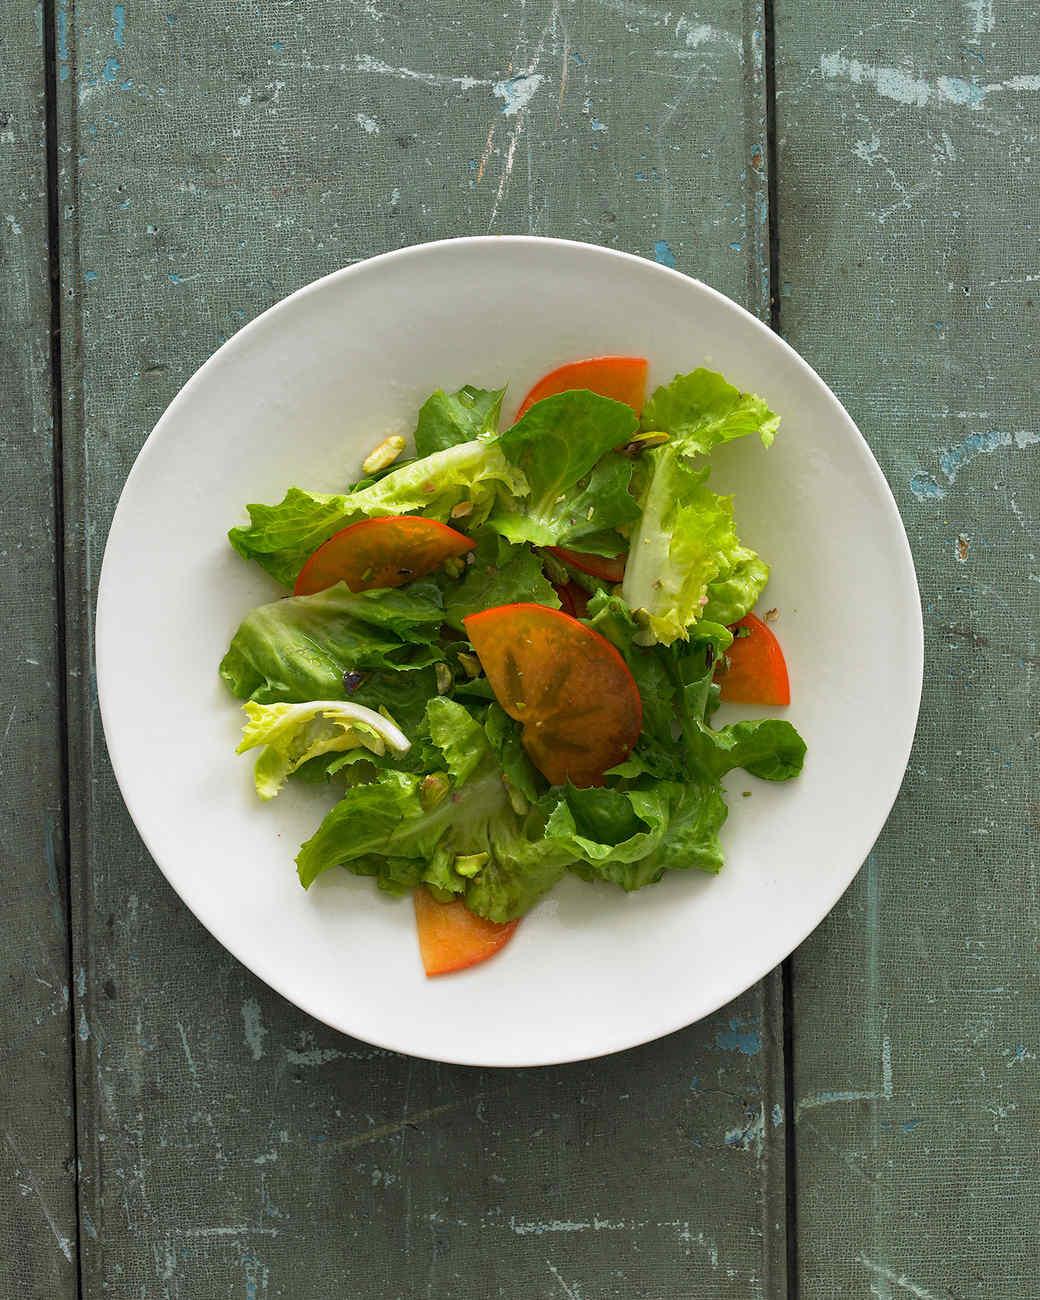 persimmon-salad-ld106276-0817